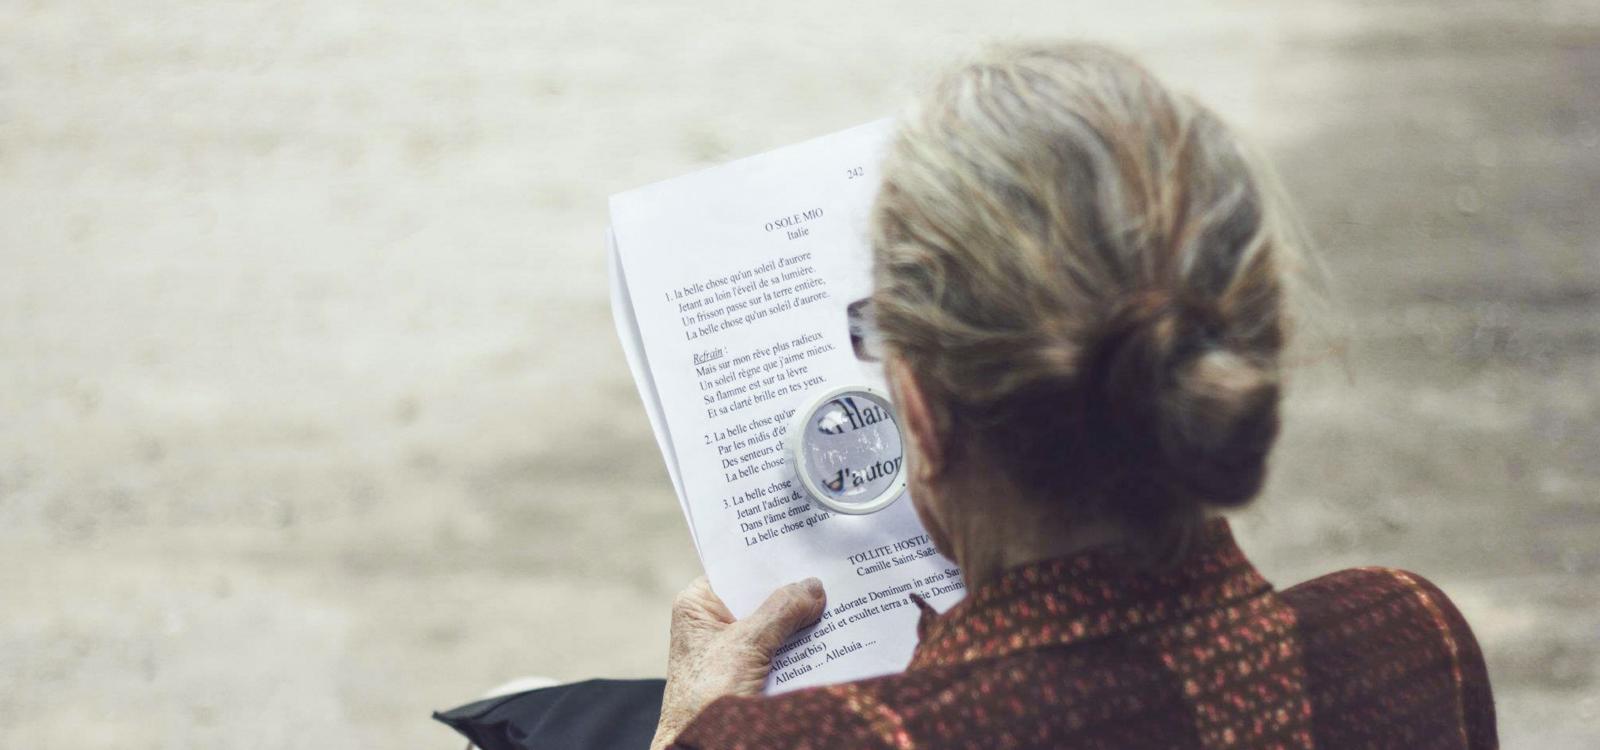 Warren Averett retirement plan terms definition image